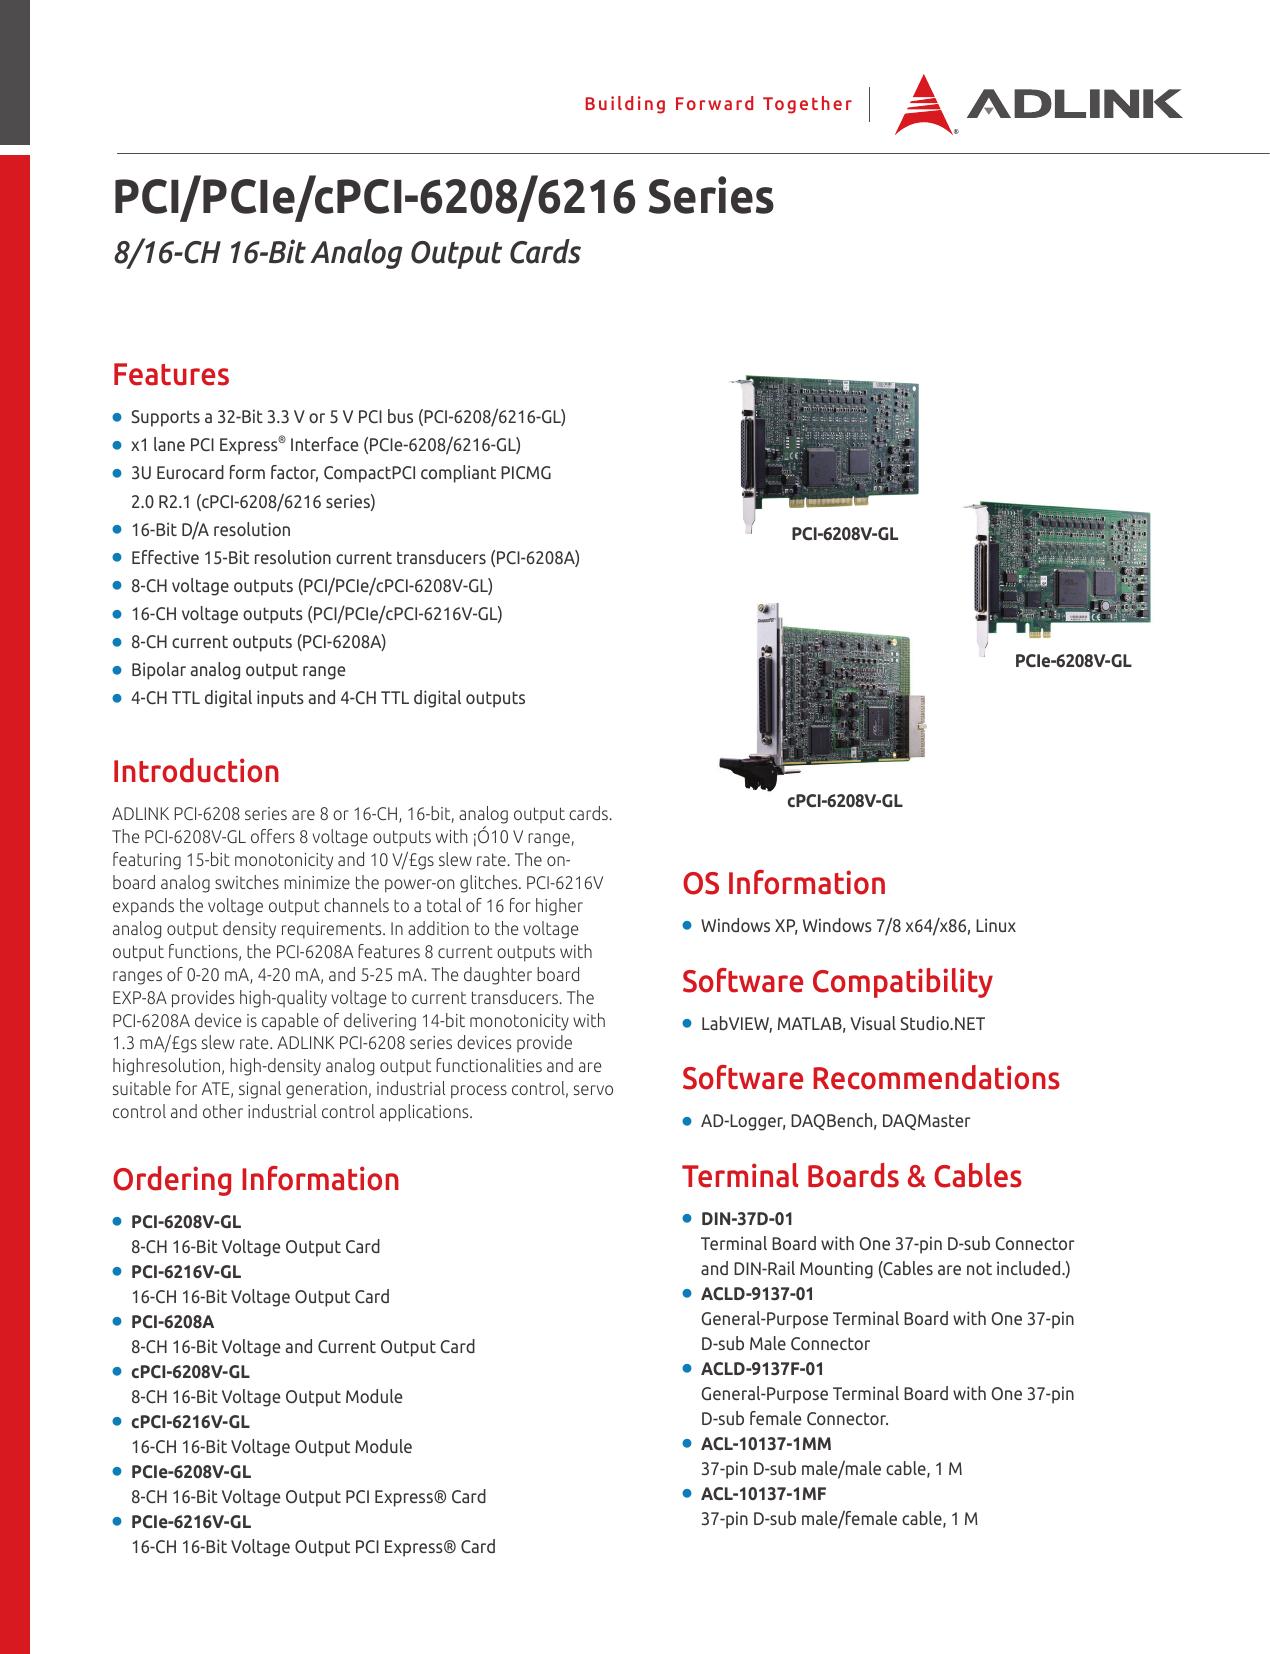 ADLINK PCI-6208/6216 Drivers for Windows XP